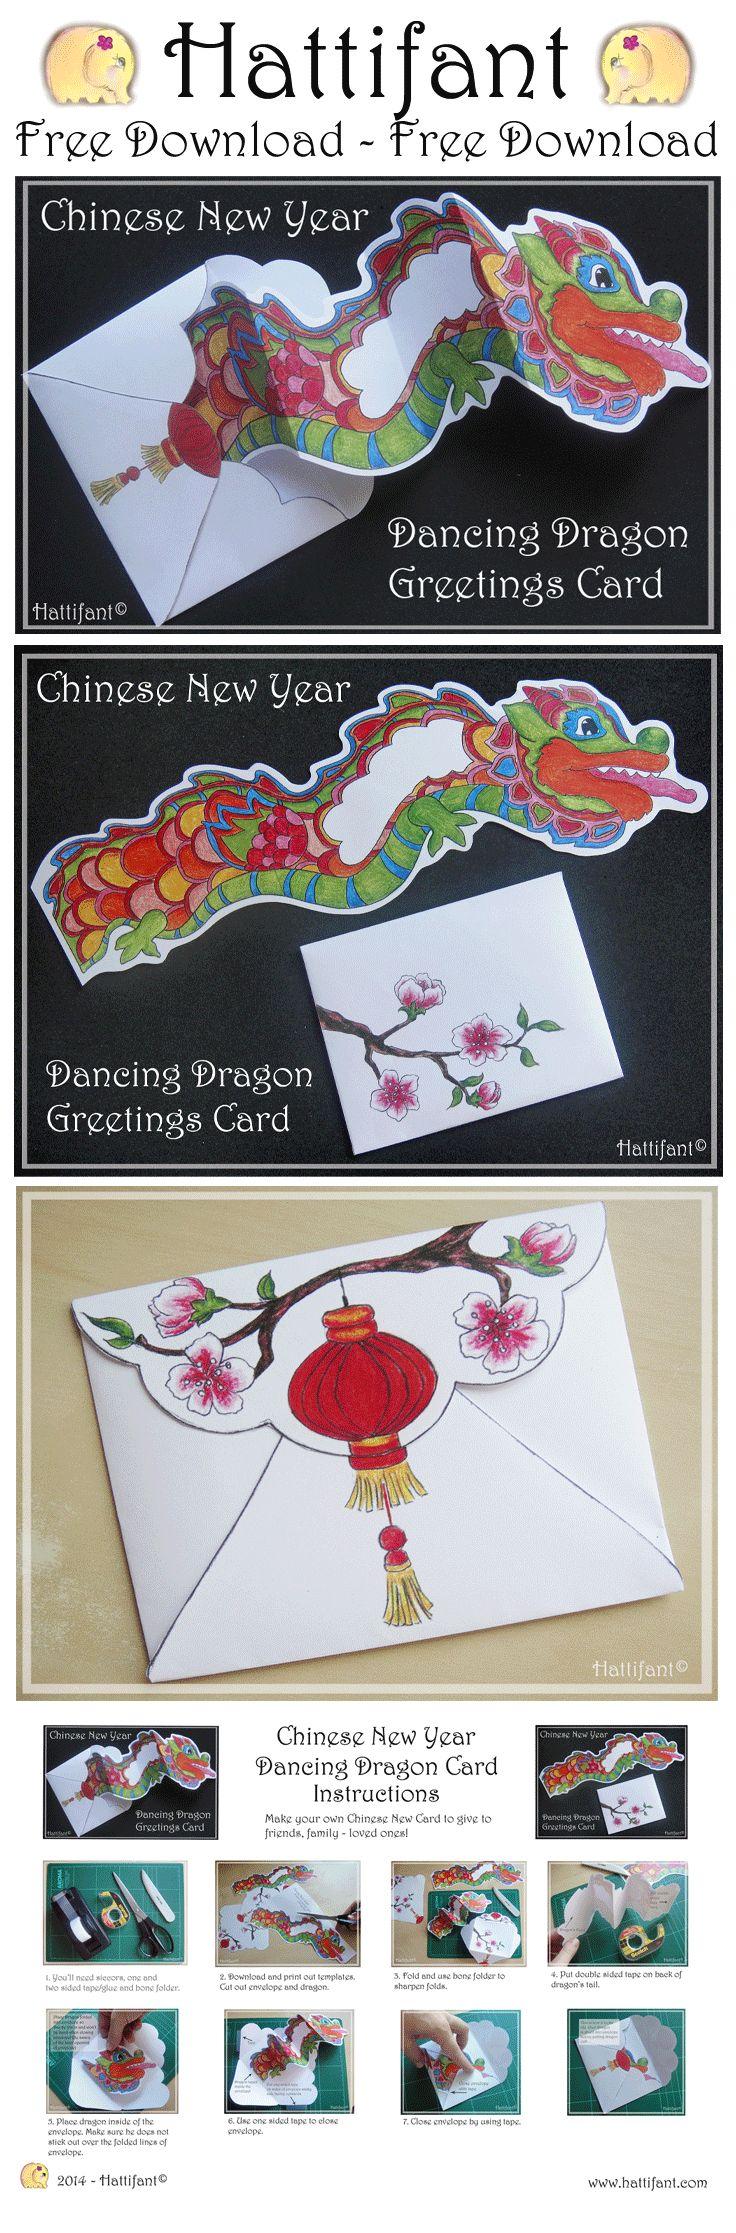 Chinese New Year Dancing Dragon Card Hattifant Chinese New Year Cards Asian Cards